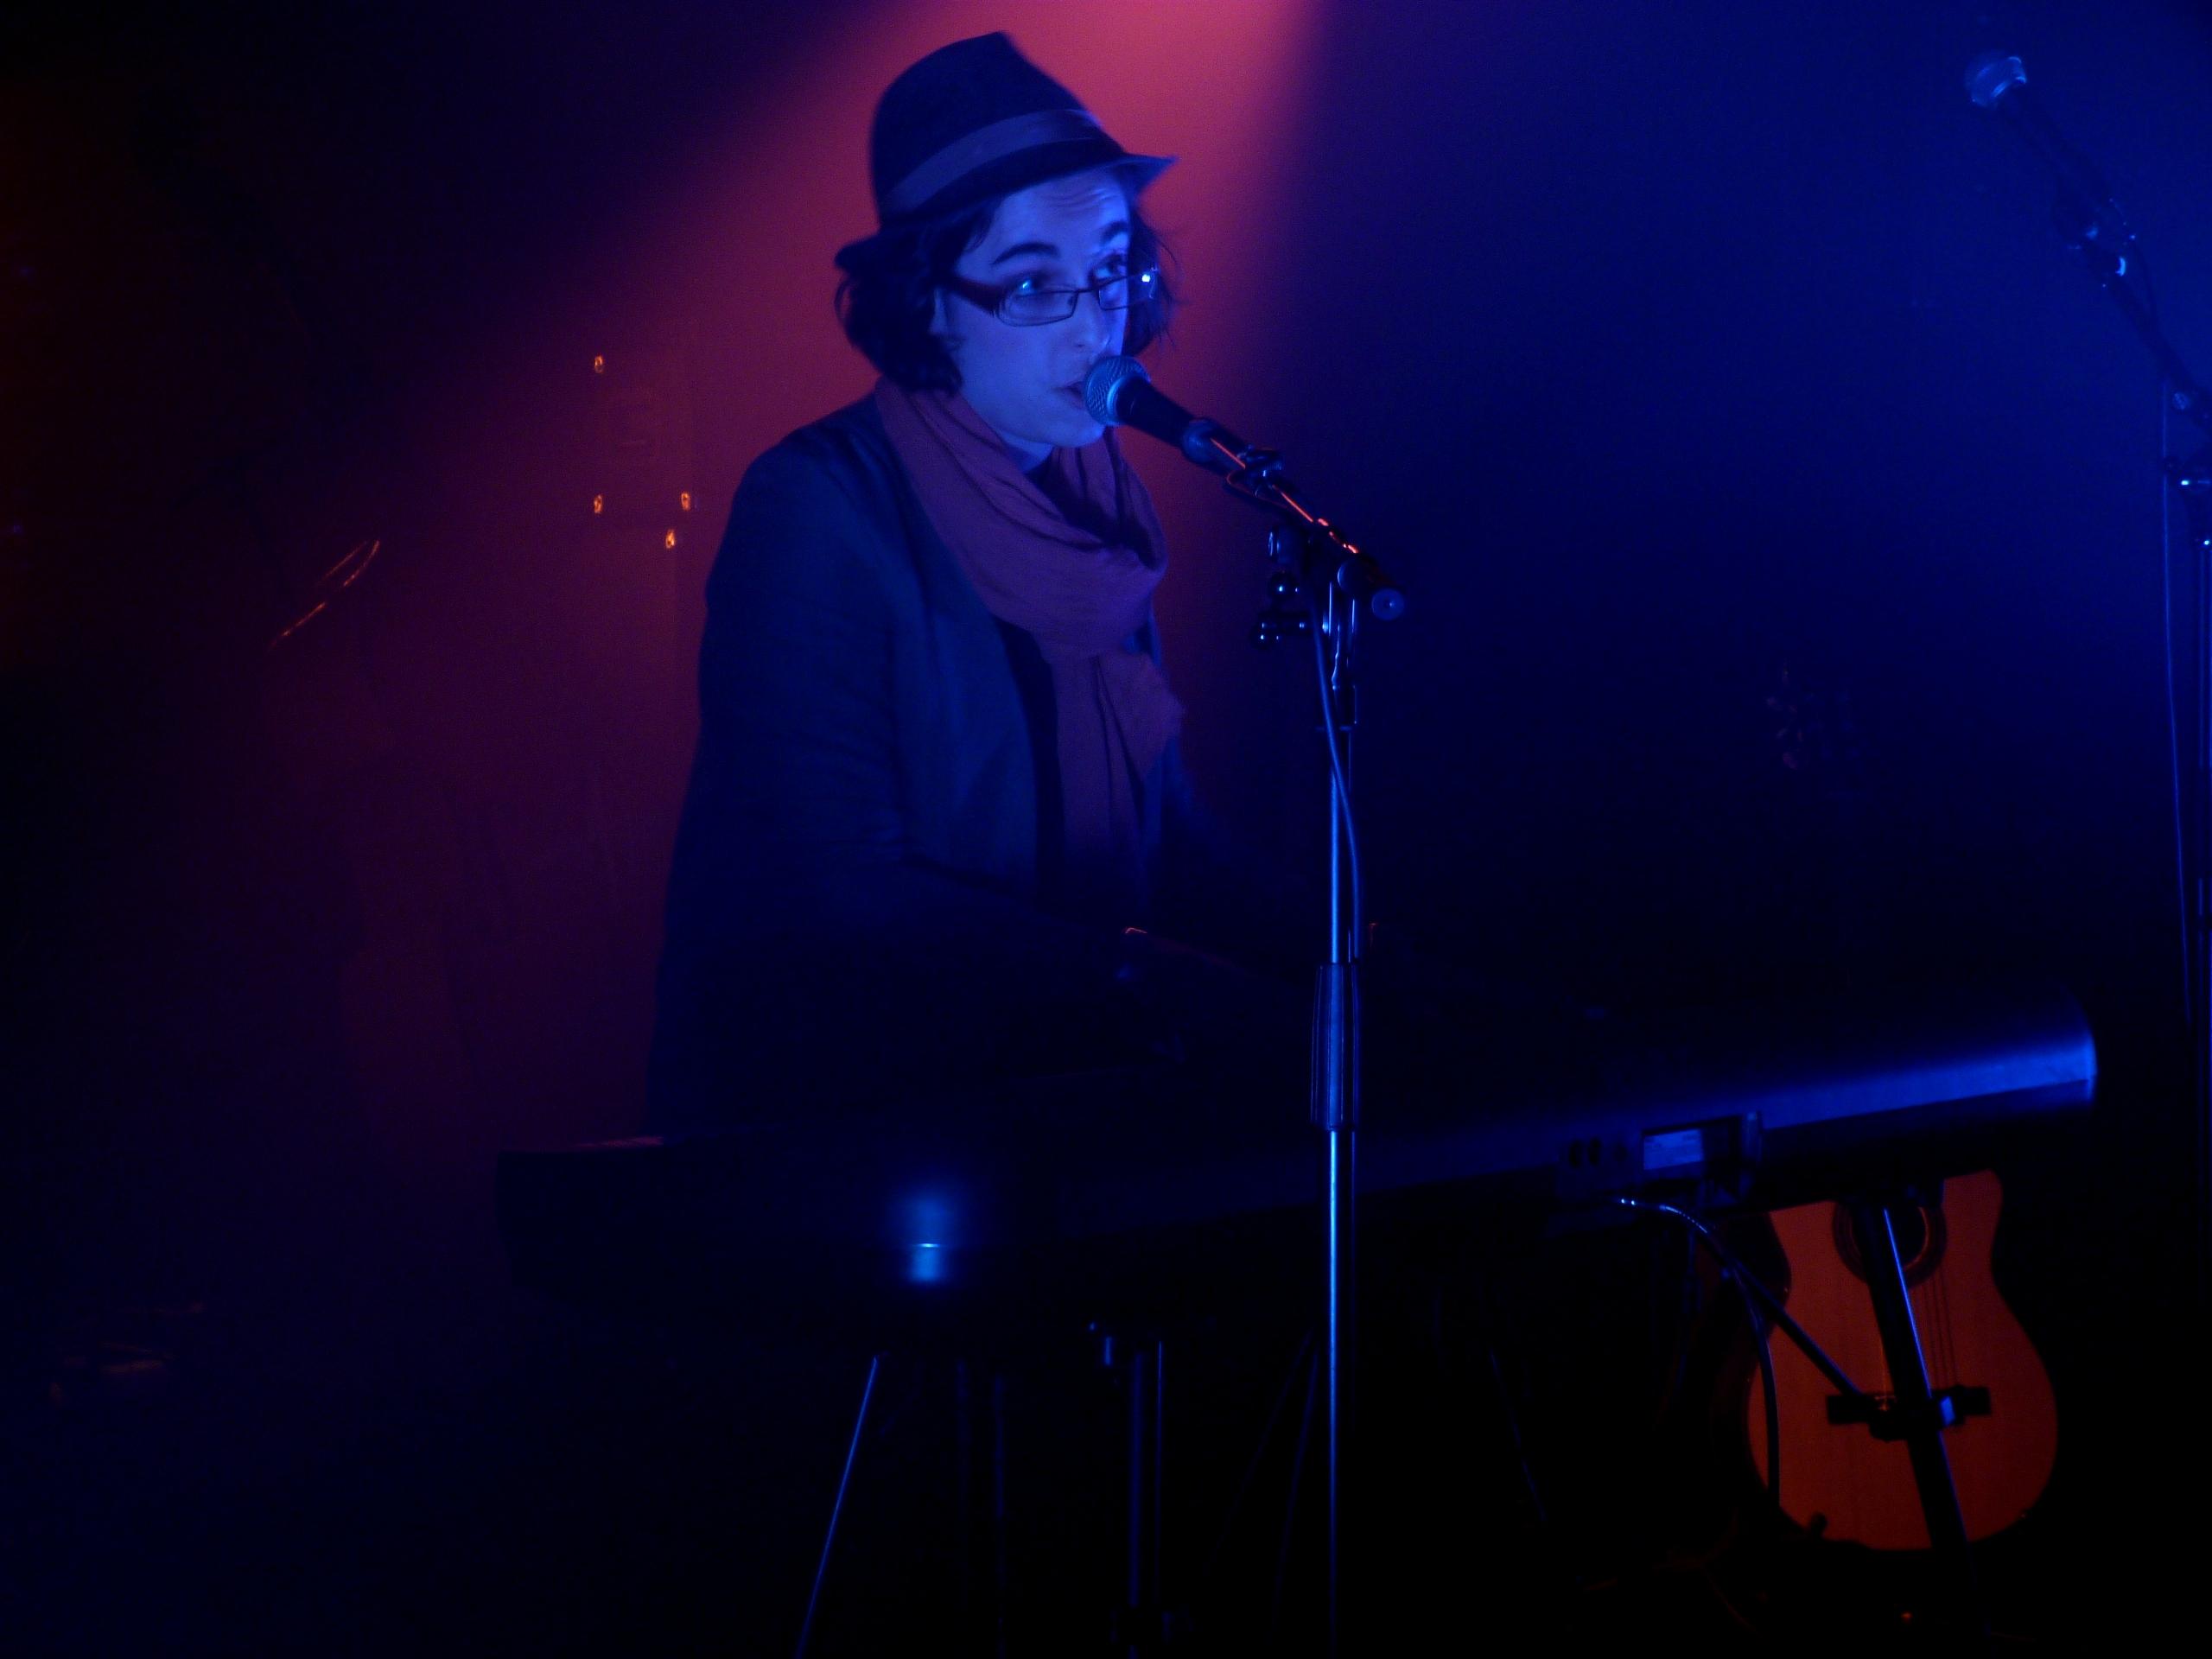 Gribouille musique - M. Rosati